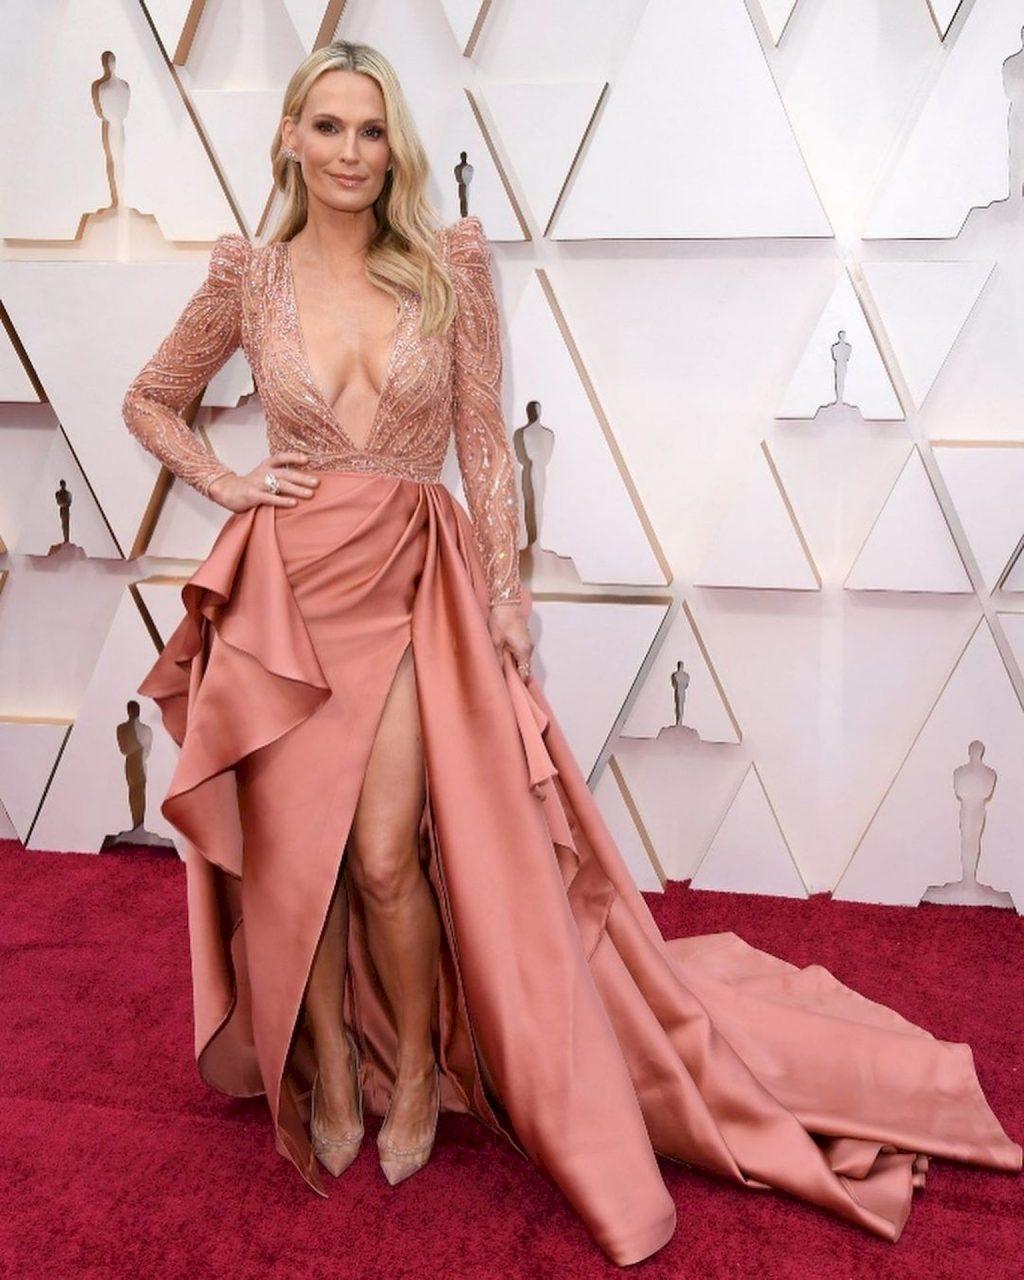 Molly Sims Stuns During Oscars 2020 Arrivals (18 Photos)